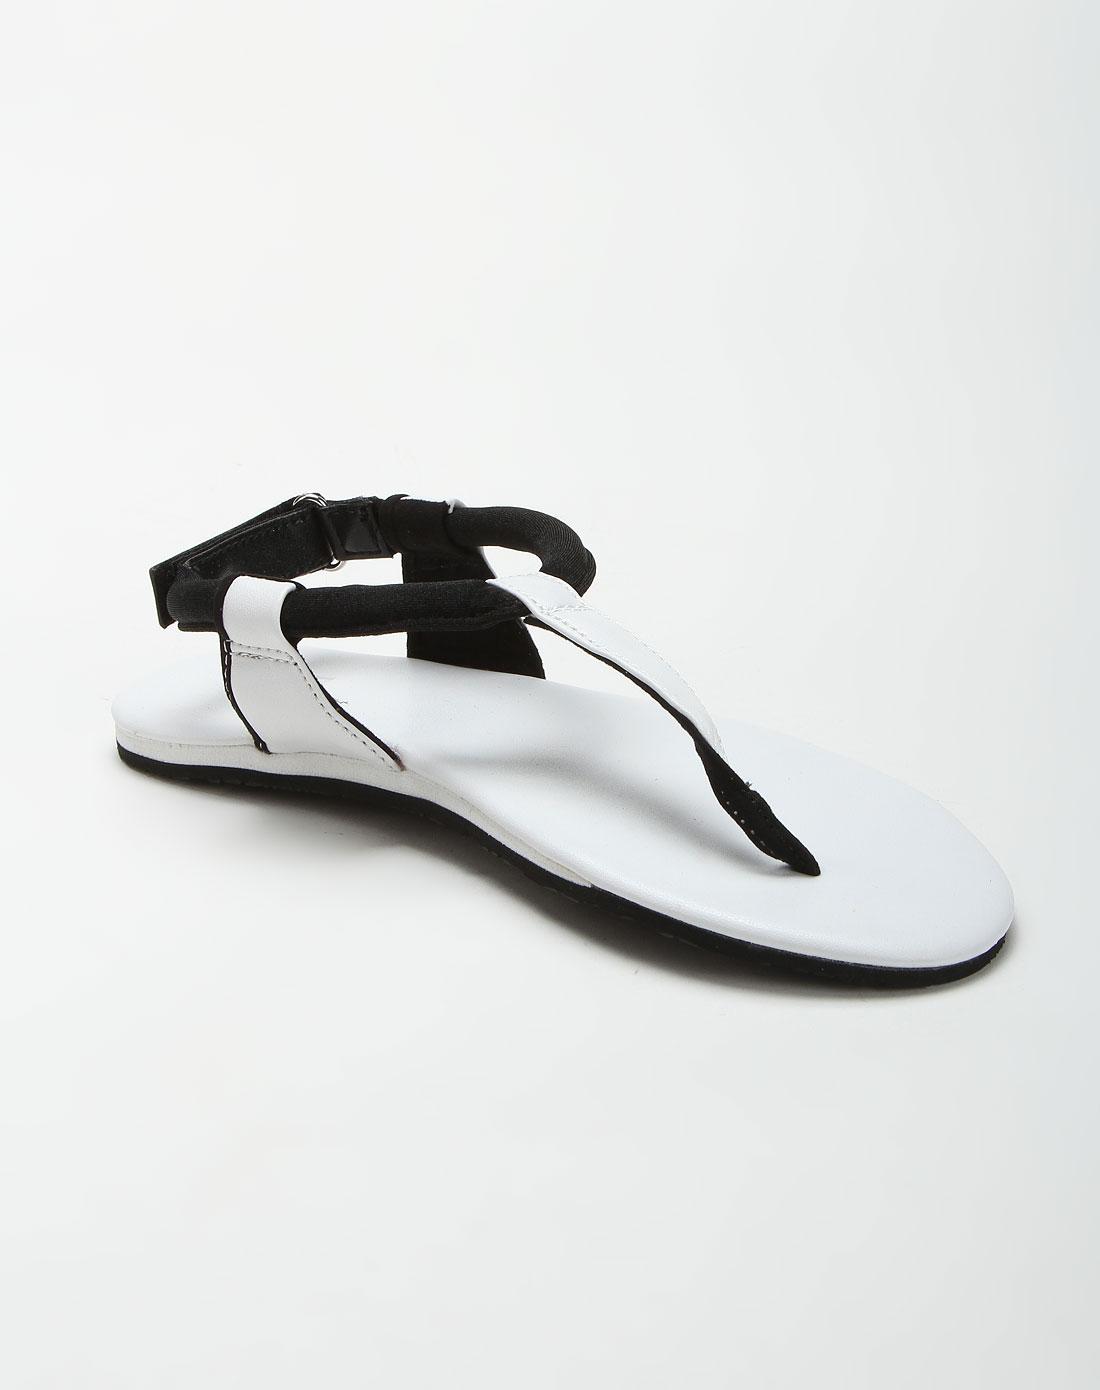 时尚简约凉拖鞋-wt